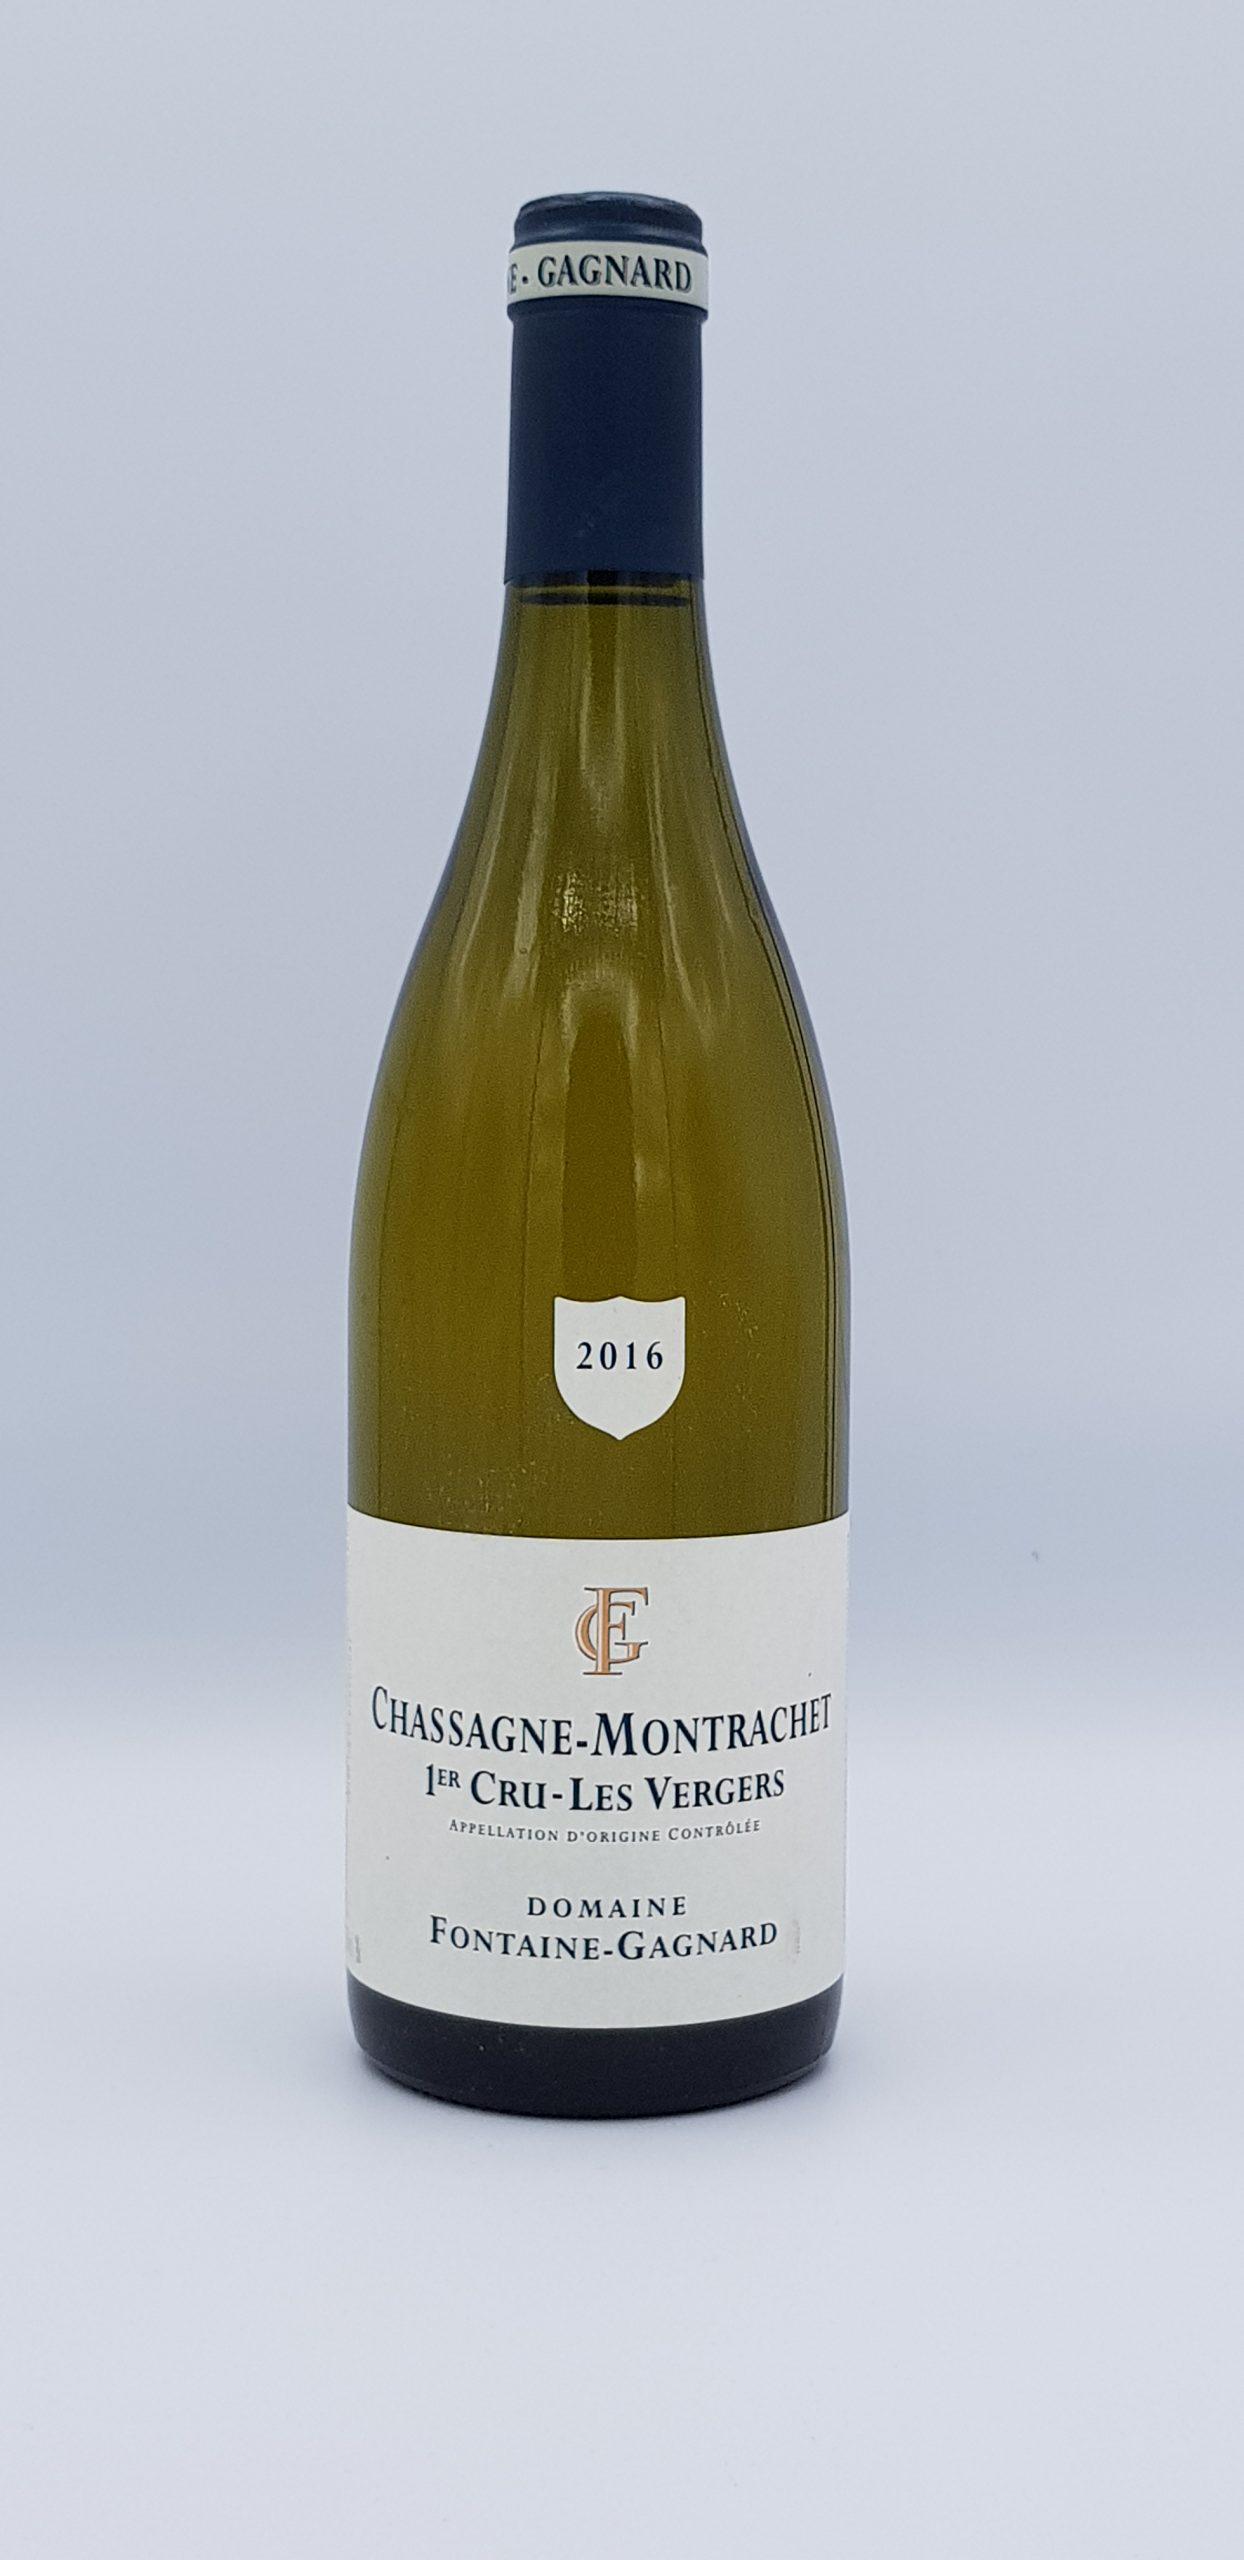 Bourgogne Chassagne Montrachet 2016 Vergers Dom Fontaine Gagnard